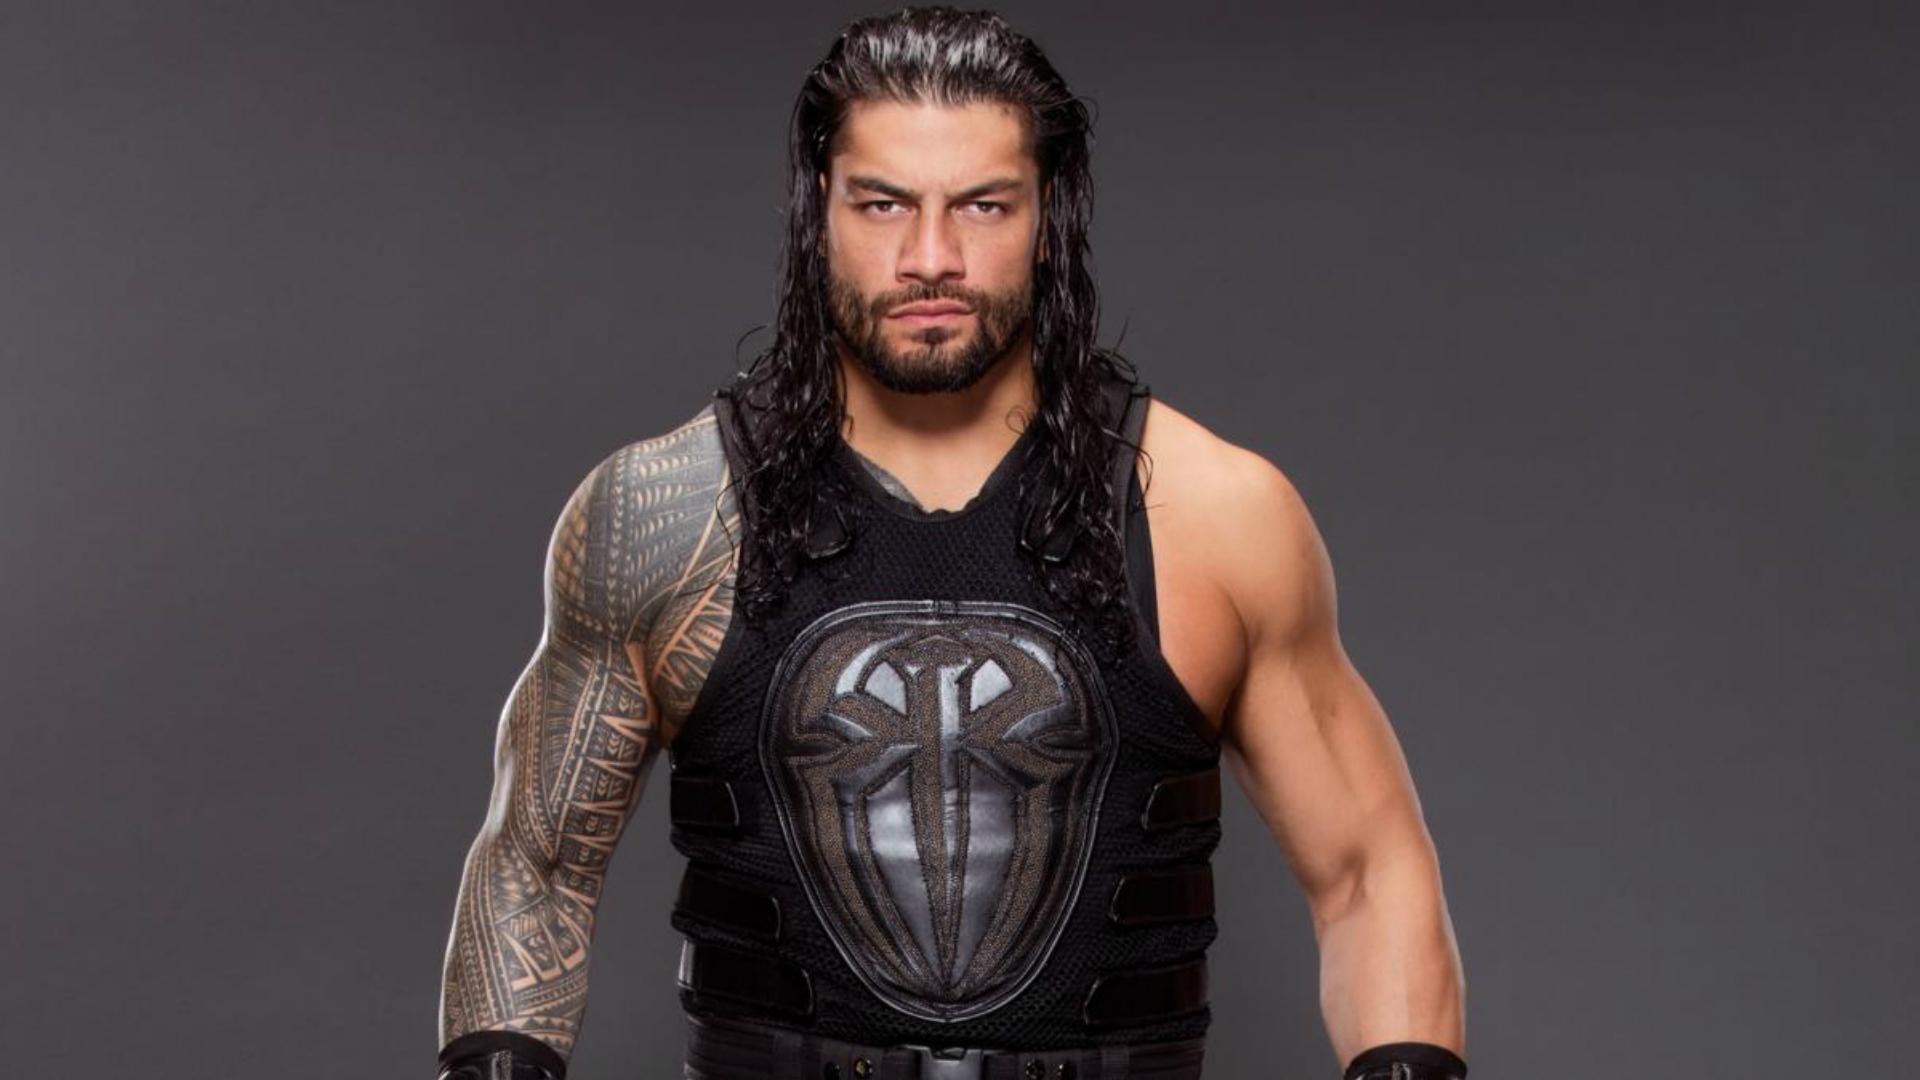 Roman Reings WWE Leucemia